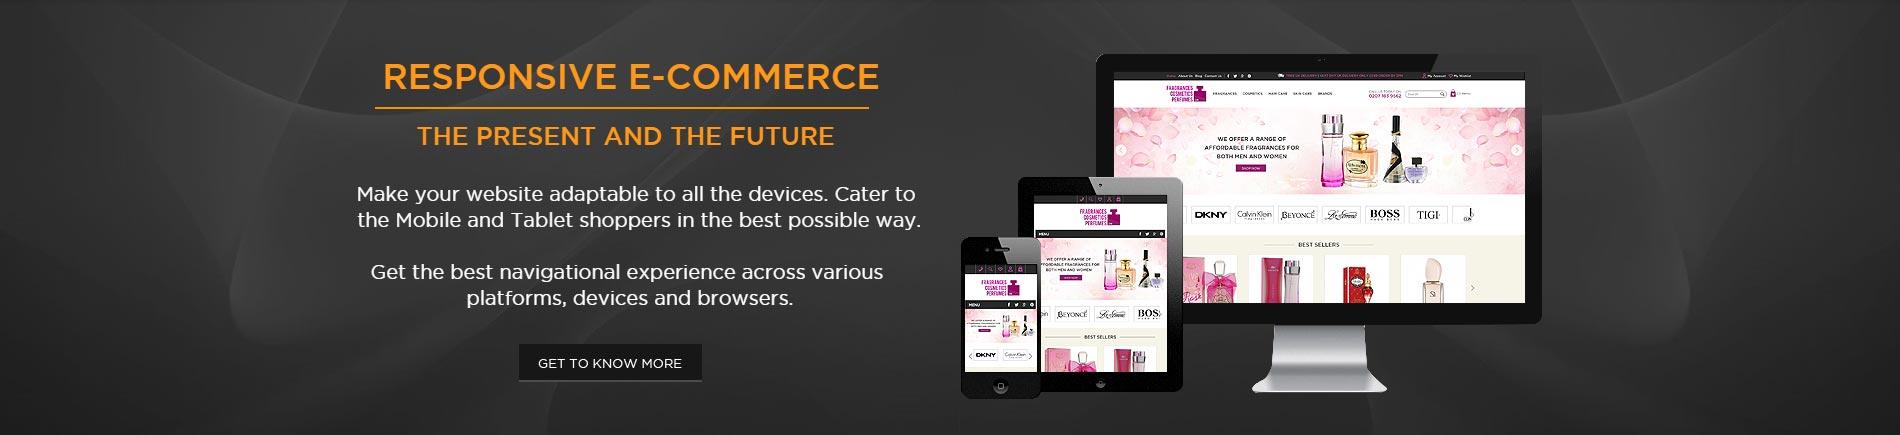 Responsive E-Commerce Development - KOL Limited